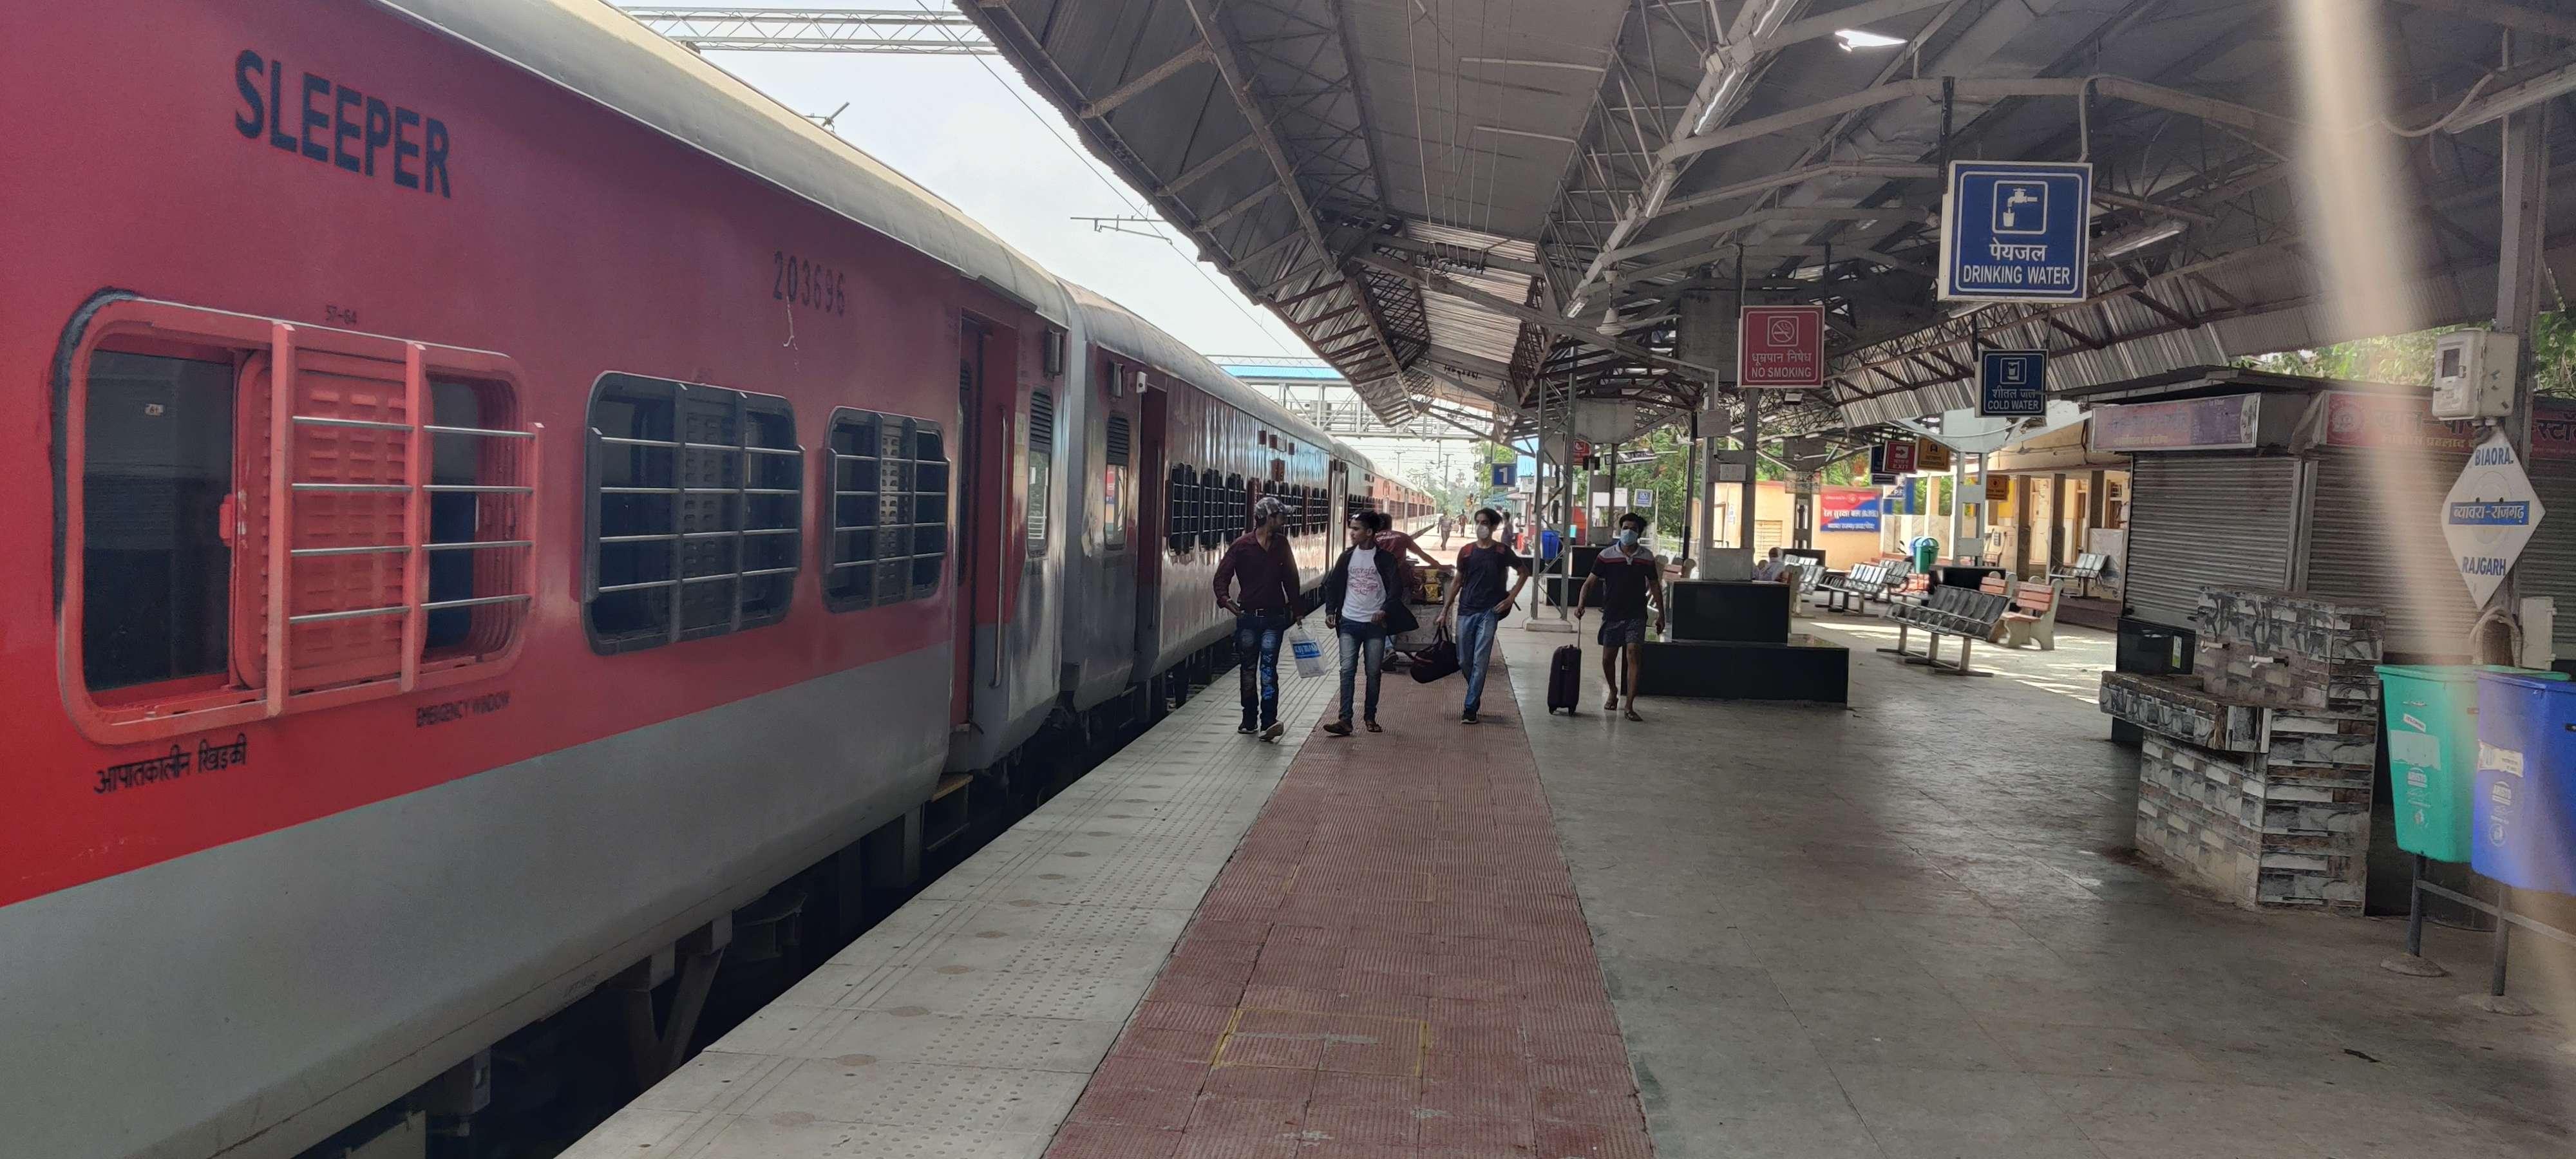 Railway news : महज छह यात्री बैठे... पहले दिन समय से पहले पहुंची चंडीगढ़ एक्सप्रेस, आधे घंटे खड़ी रही